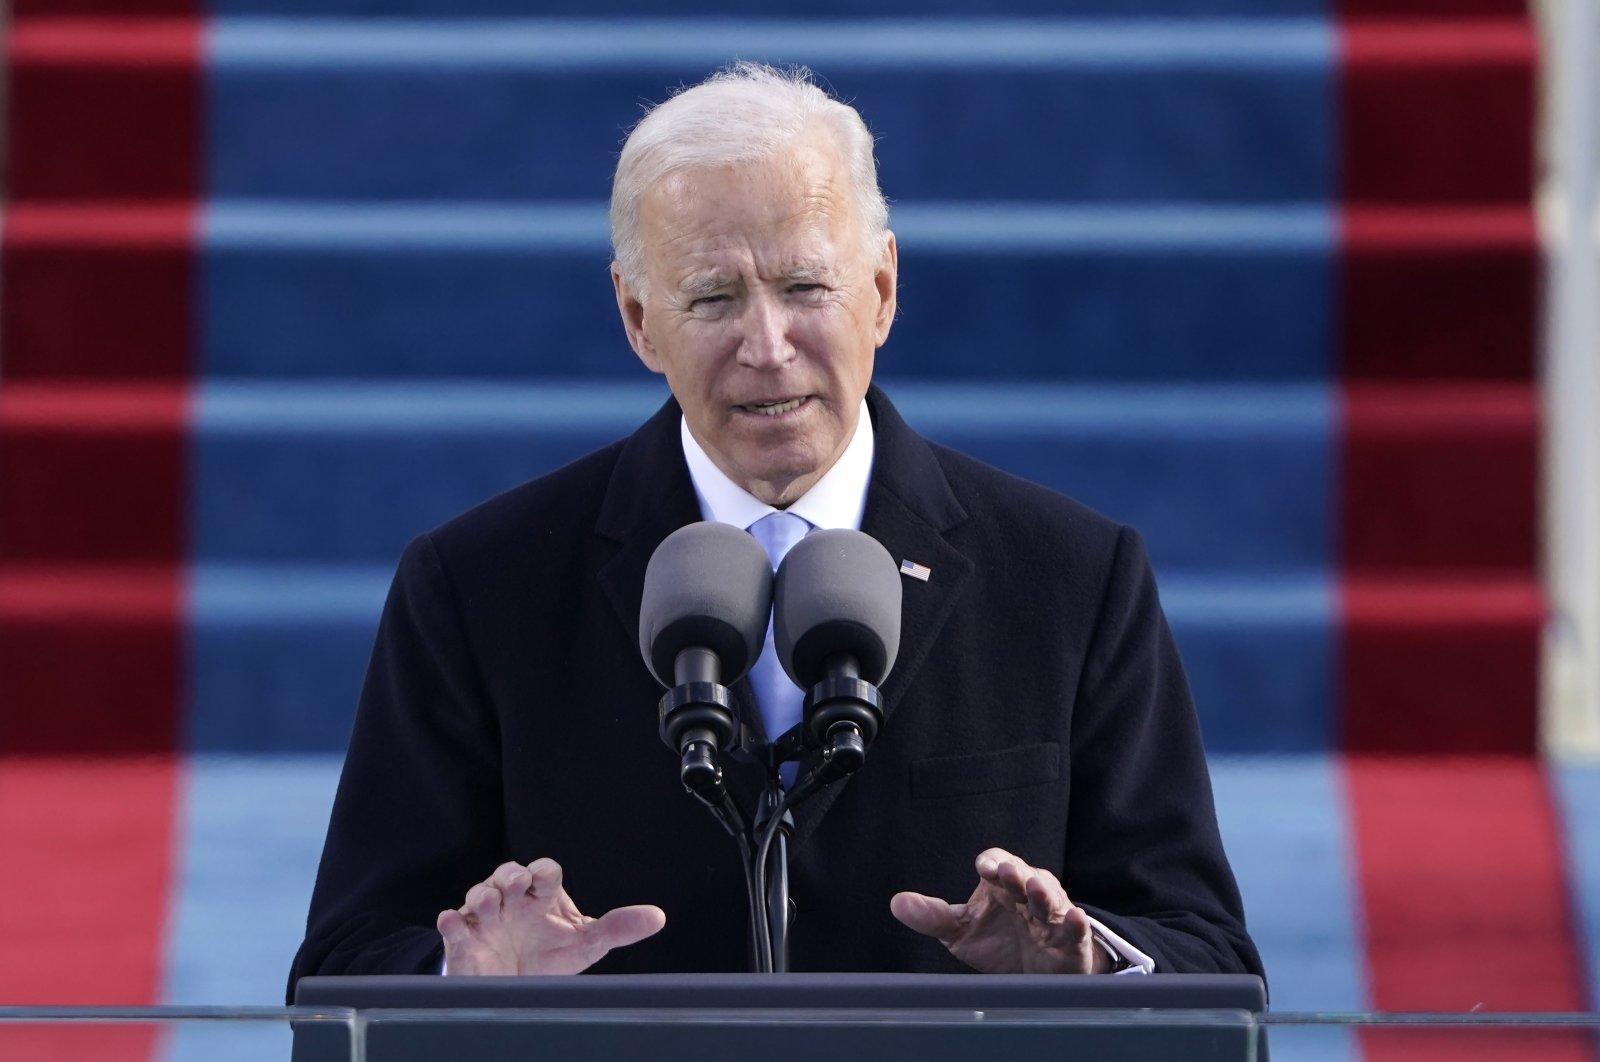 President Joe Biden speaks during the 59th Presidential Inauguration at the U.S. Capitol in Washington, D.C., U.S., Jan. 20, 2021. (AP Photo)